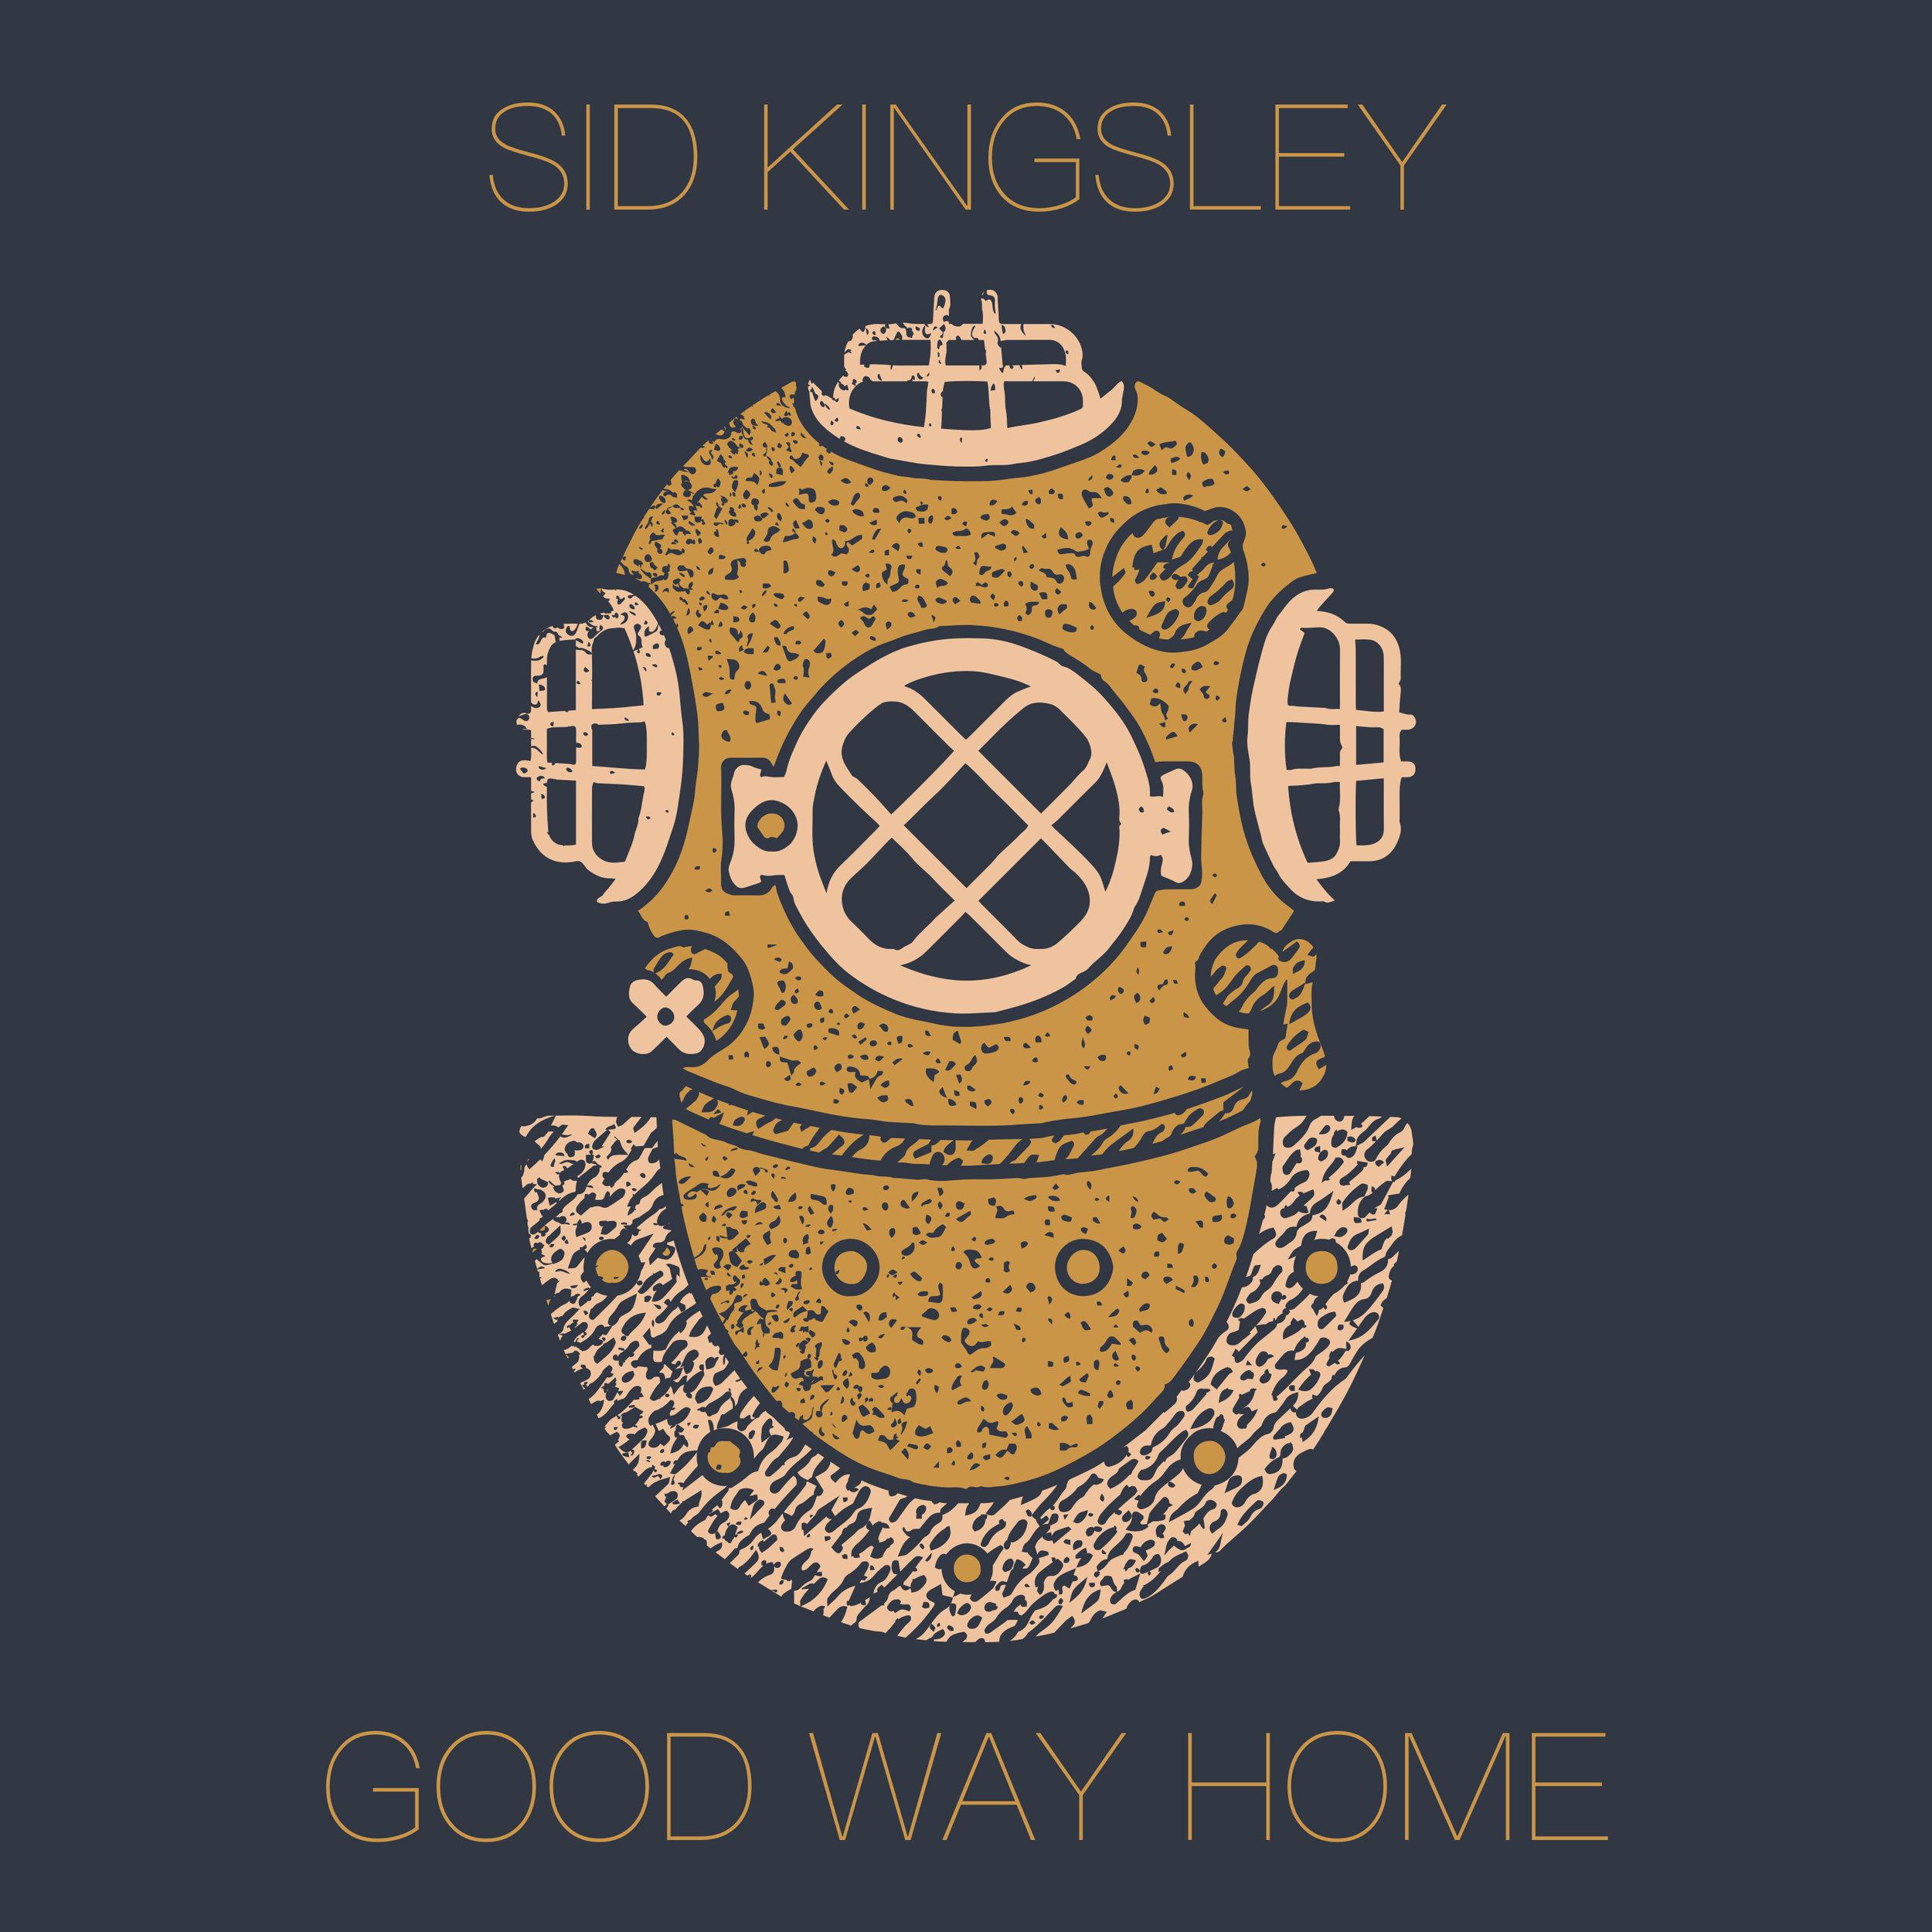 Sid Kingsley  Good Way Home  (2017)  producer, engineer, mix